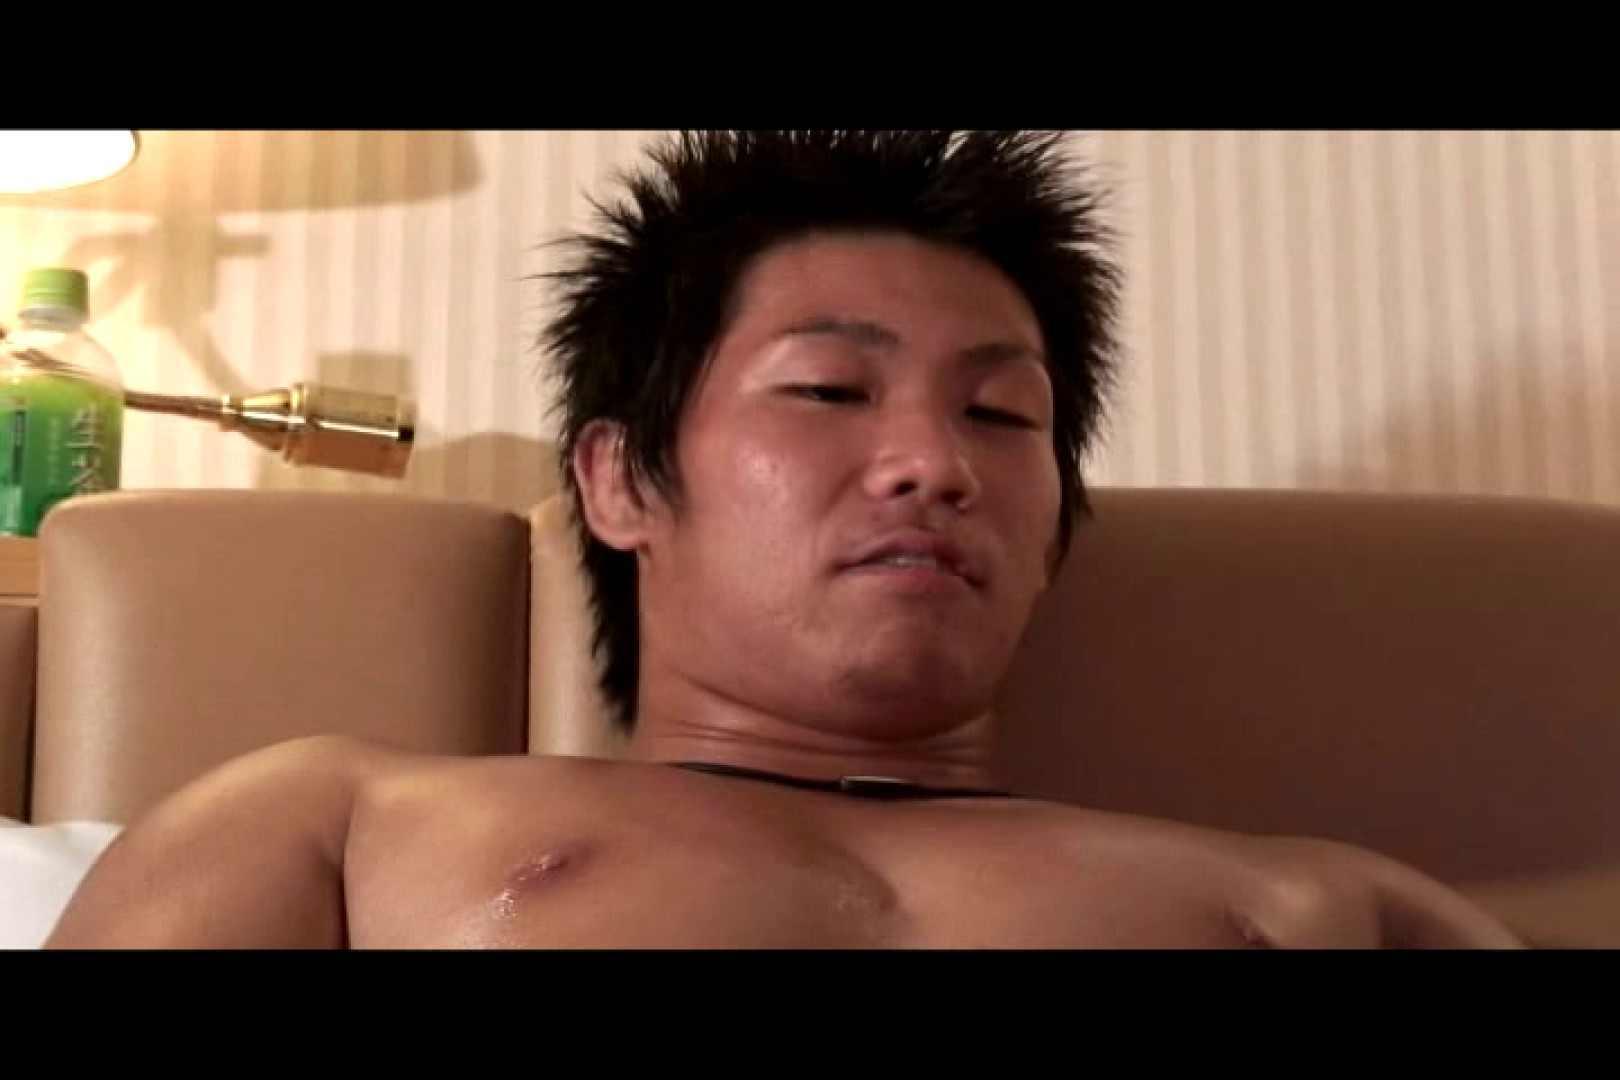 Bistro「イケメン」~Mokkori和風仕立て~vol.03 ゲイのオナニー映像 男同士動画 90枚 78